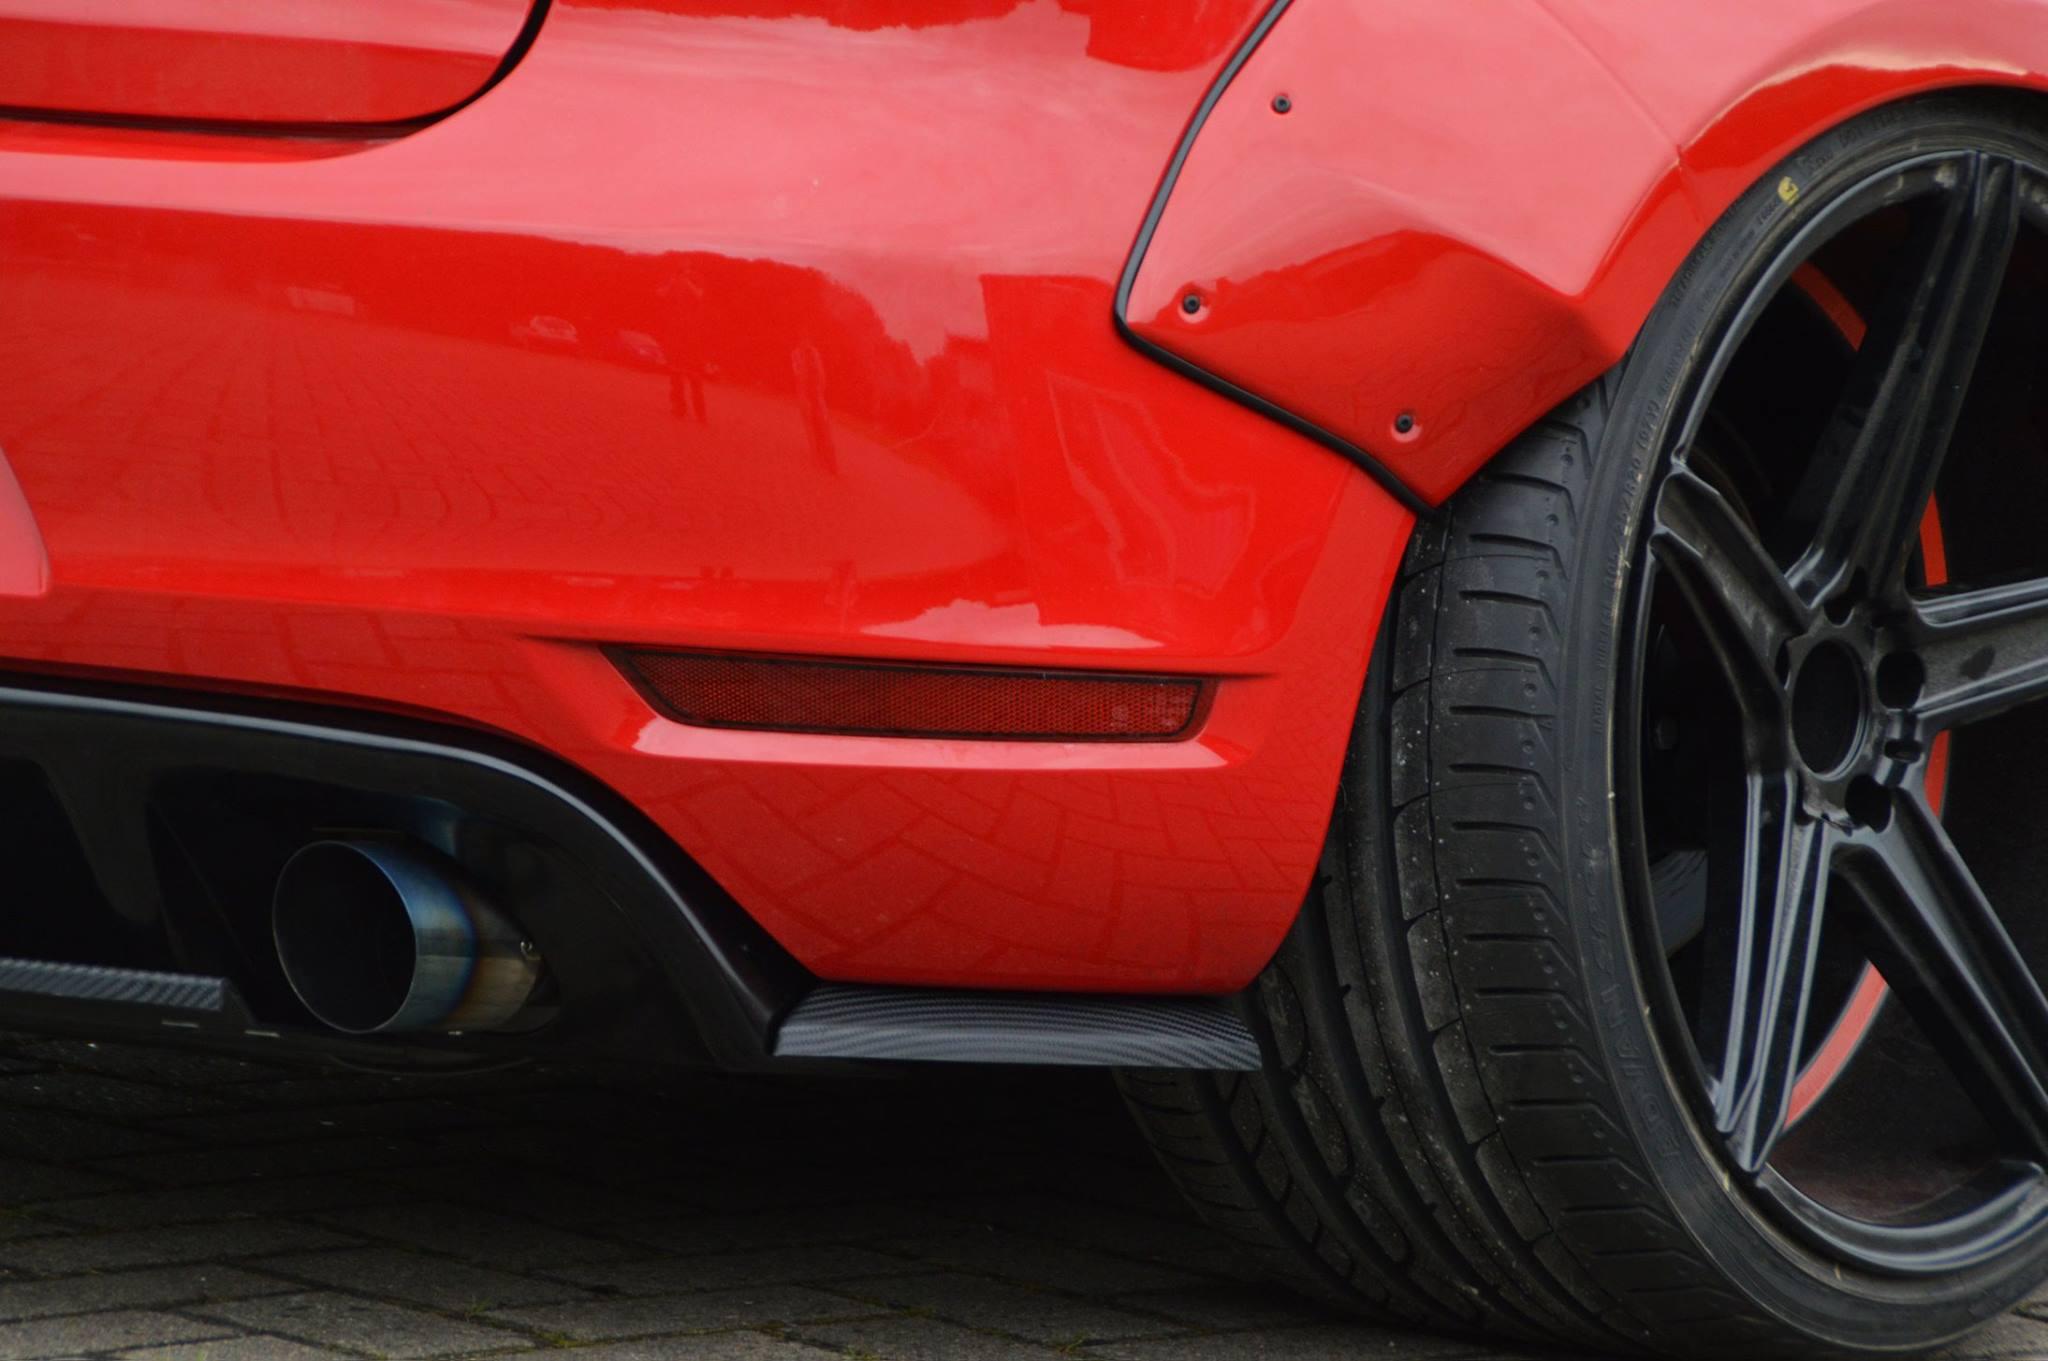 Golf 6 GTI Gets Widebody Kit from Ingo Noak: the European Rocket Bunny ...